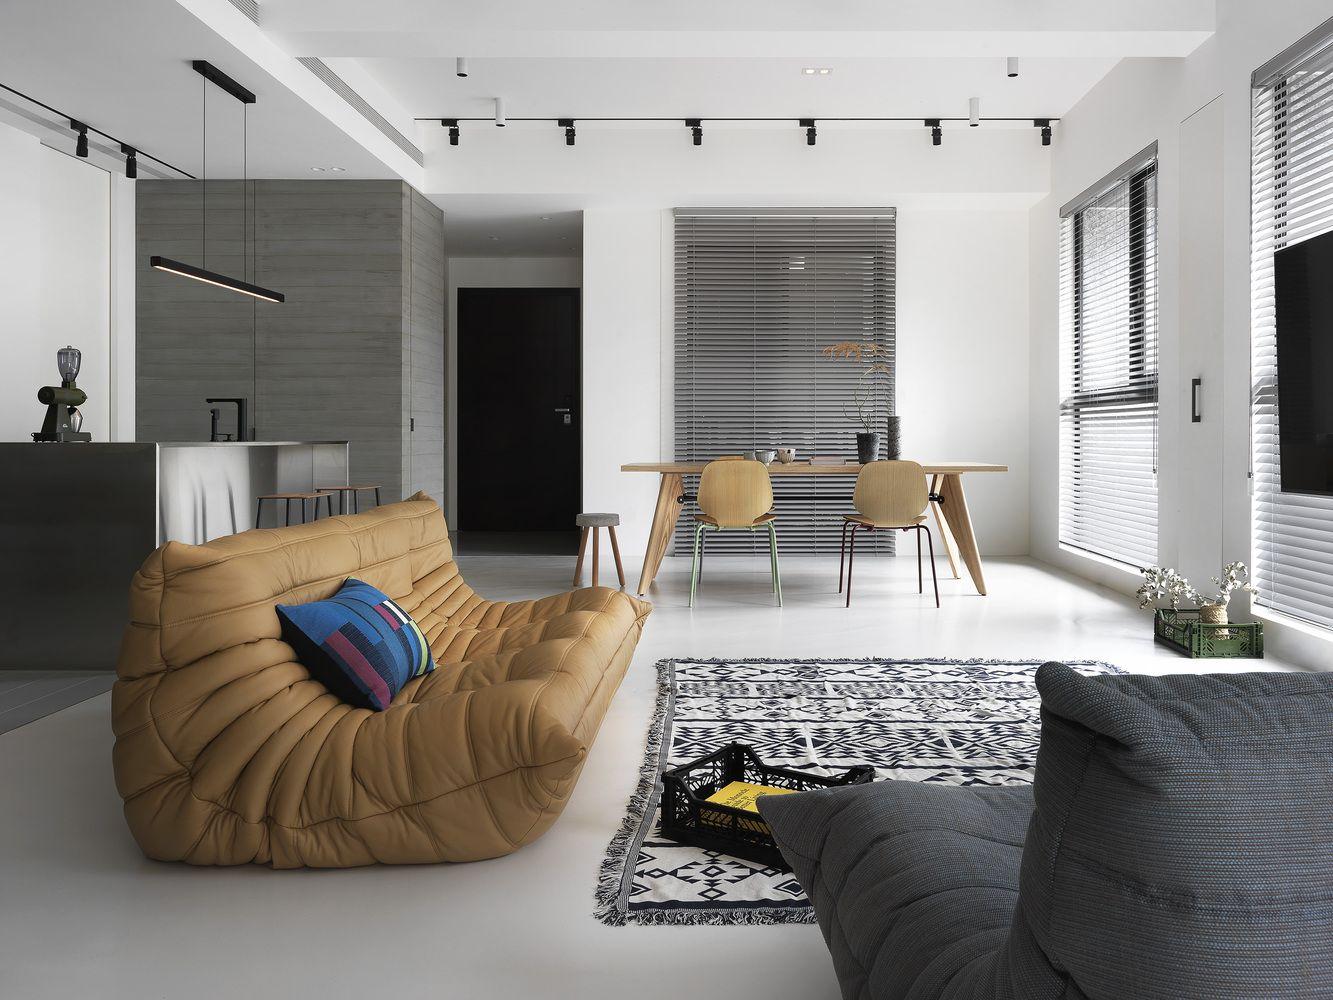 Galería de Casa Chiang / 2BOOKS design - 2 | Galerías, Diseño de ...